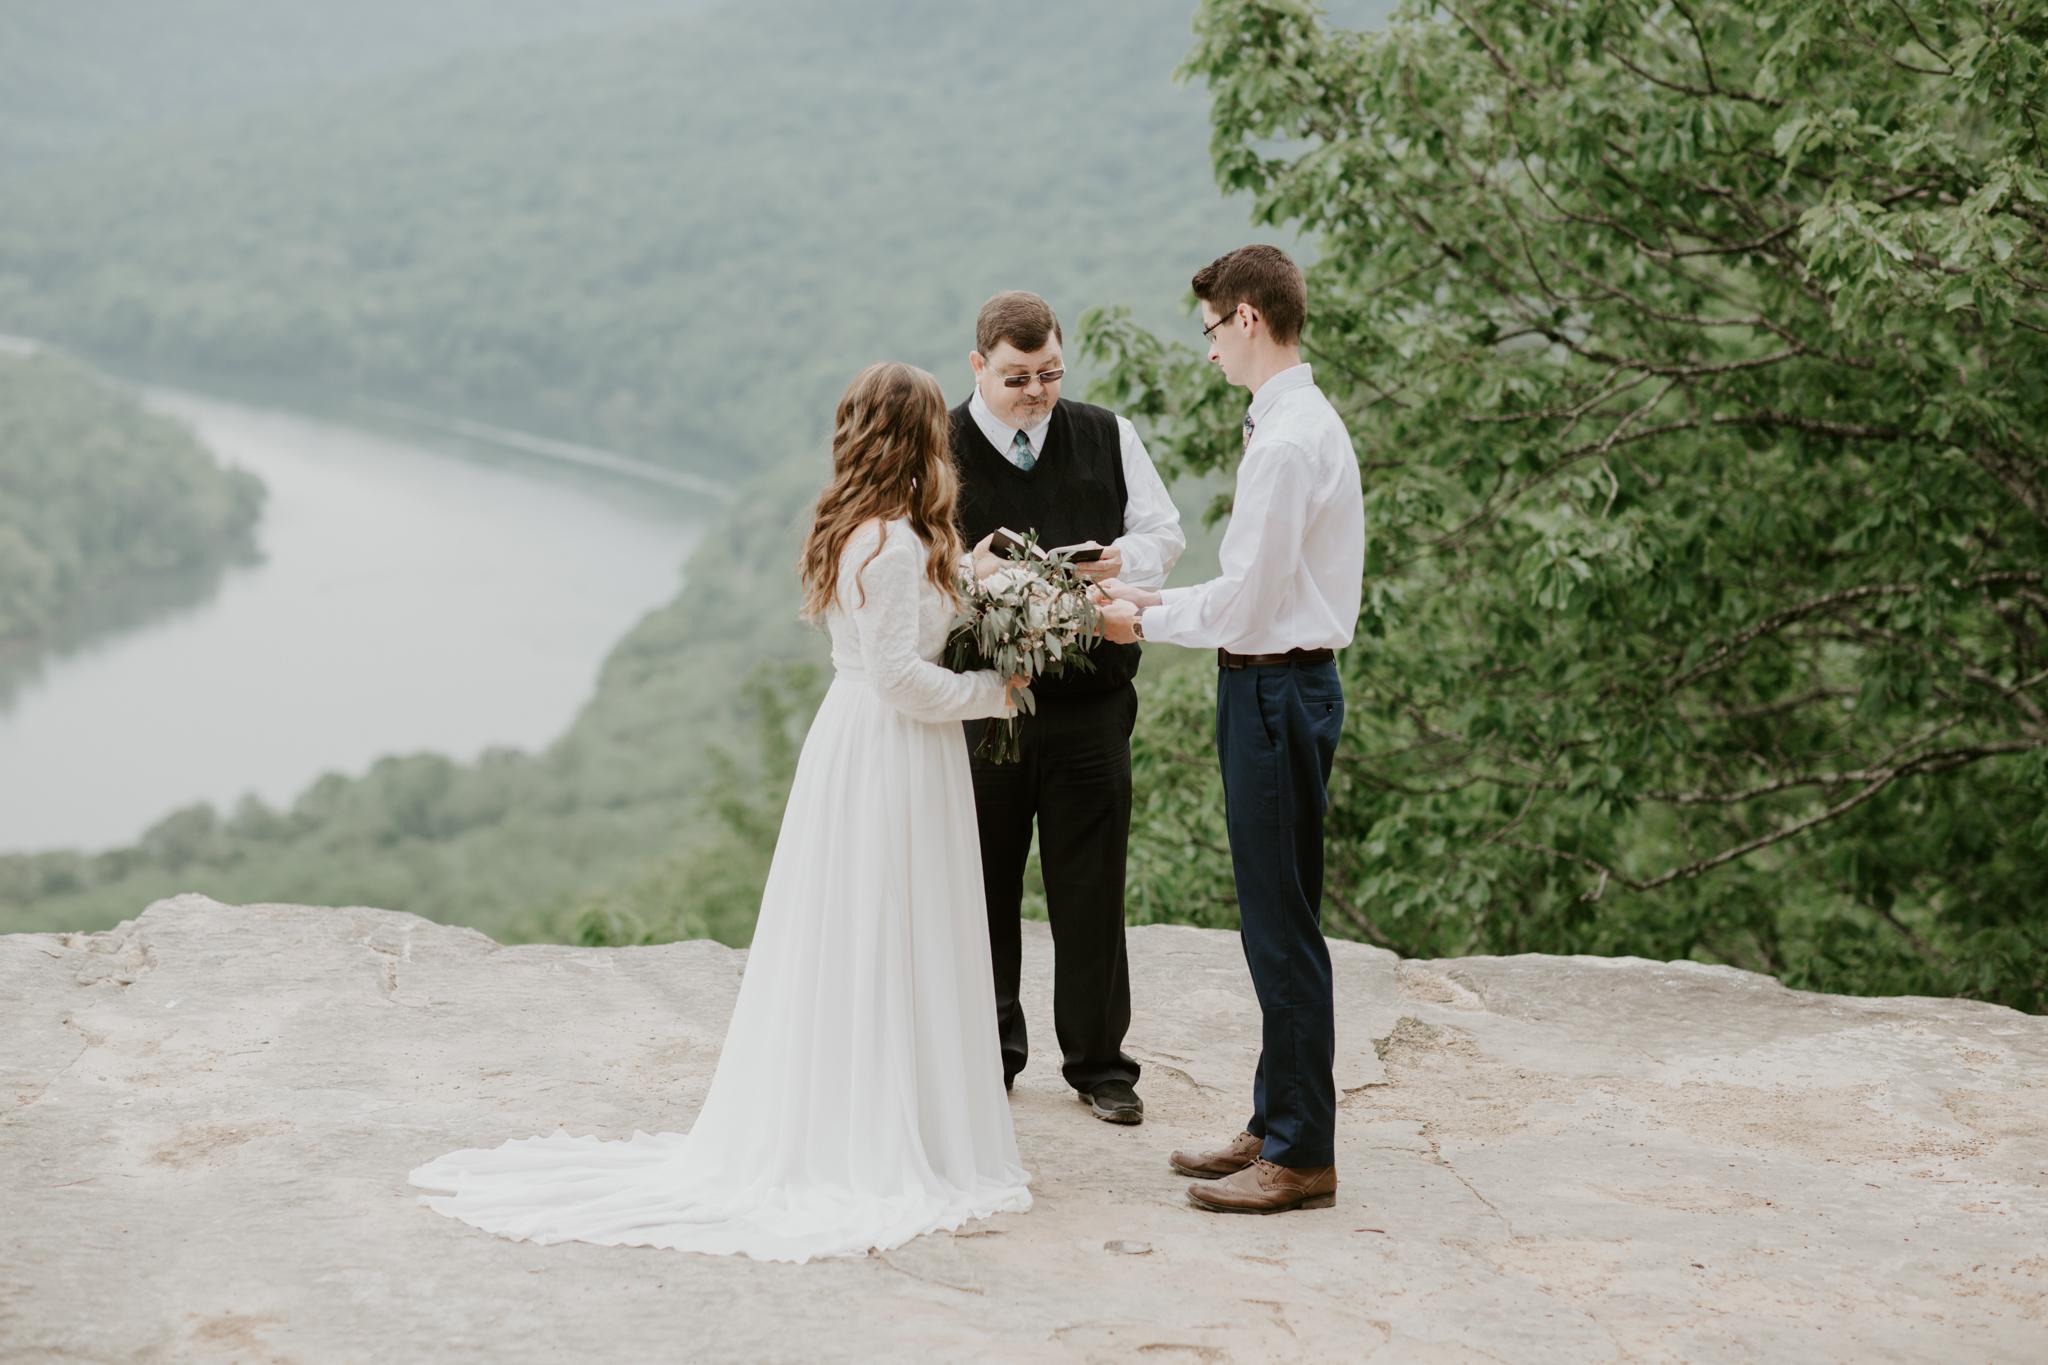 Lacey-Joe-Chattanooga-Nashville-Tennessee-Wedding-Elopement-Photographer-70.jpg